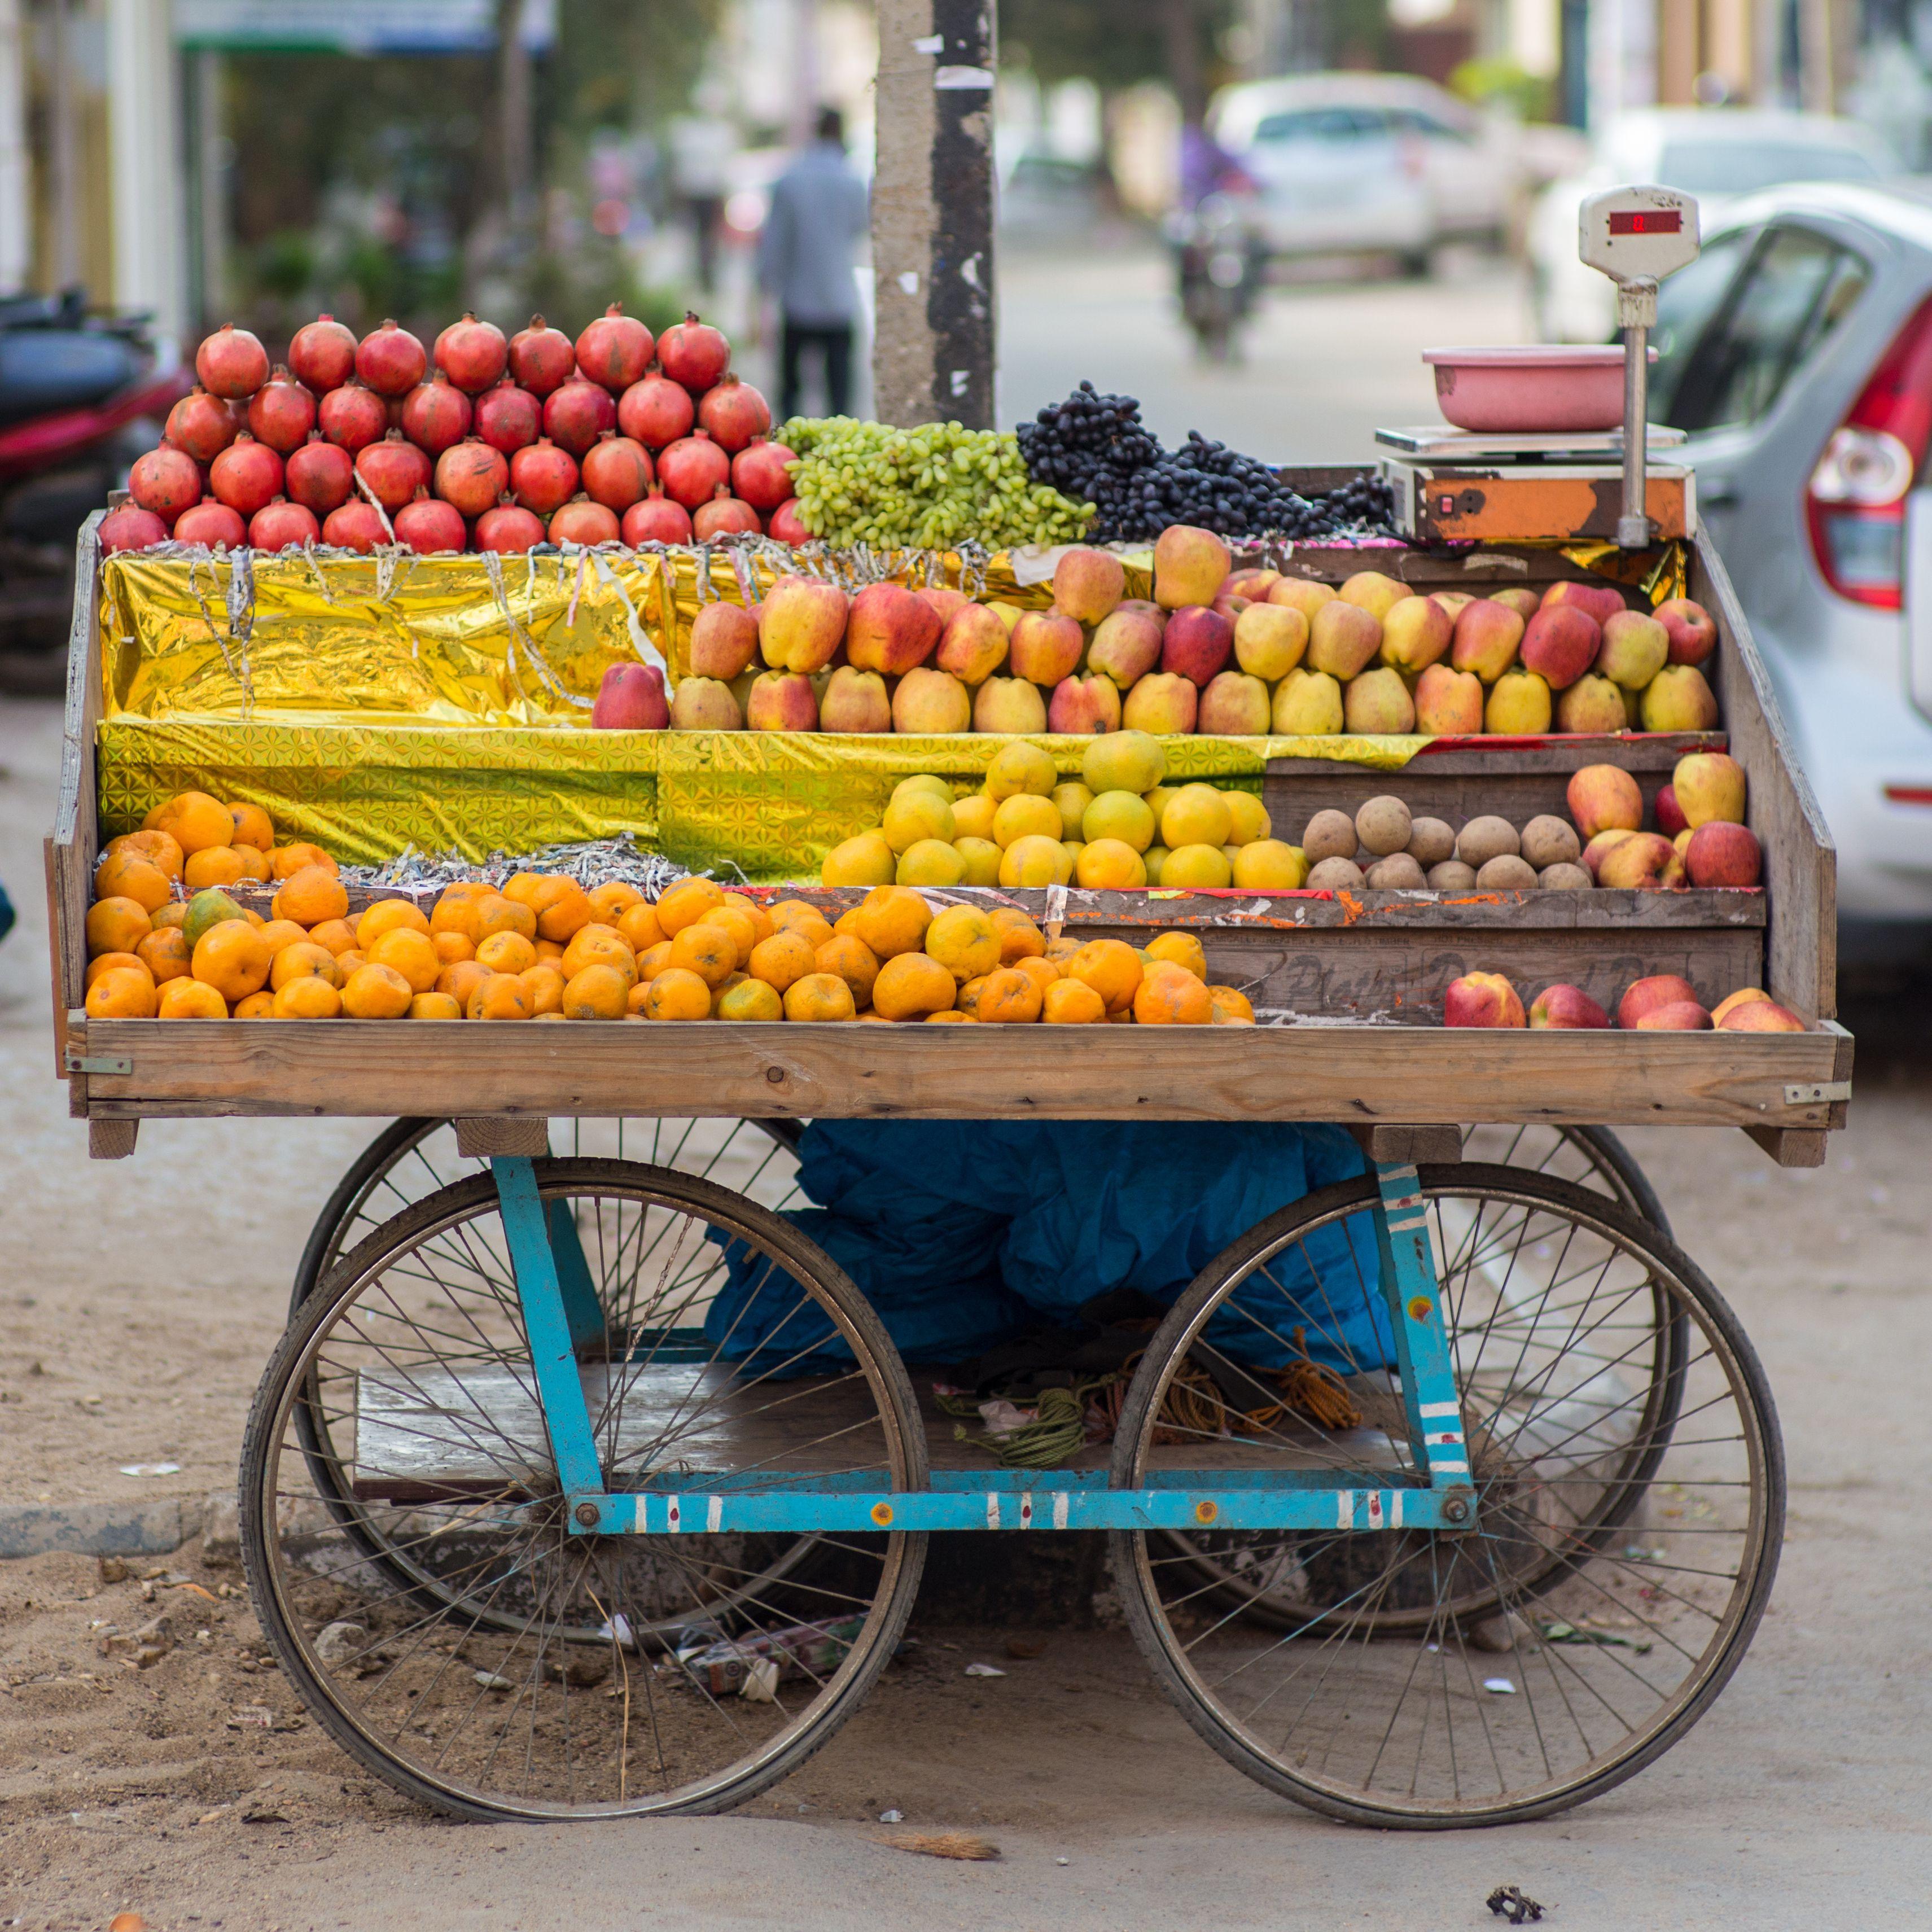 Mumbai markets the impact of supermarkets on traditional